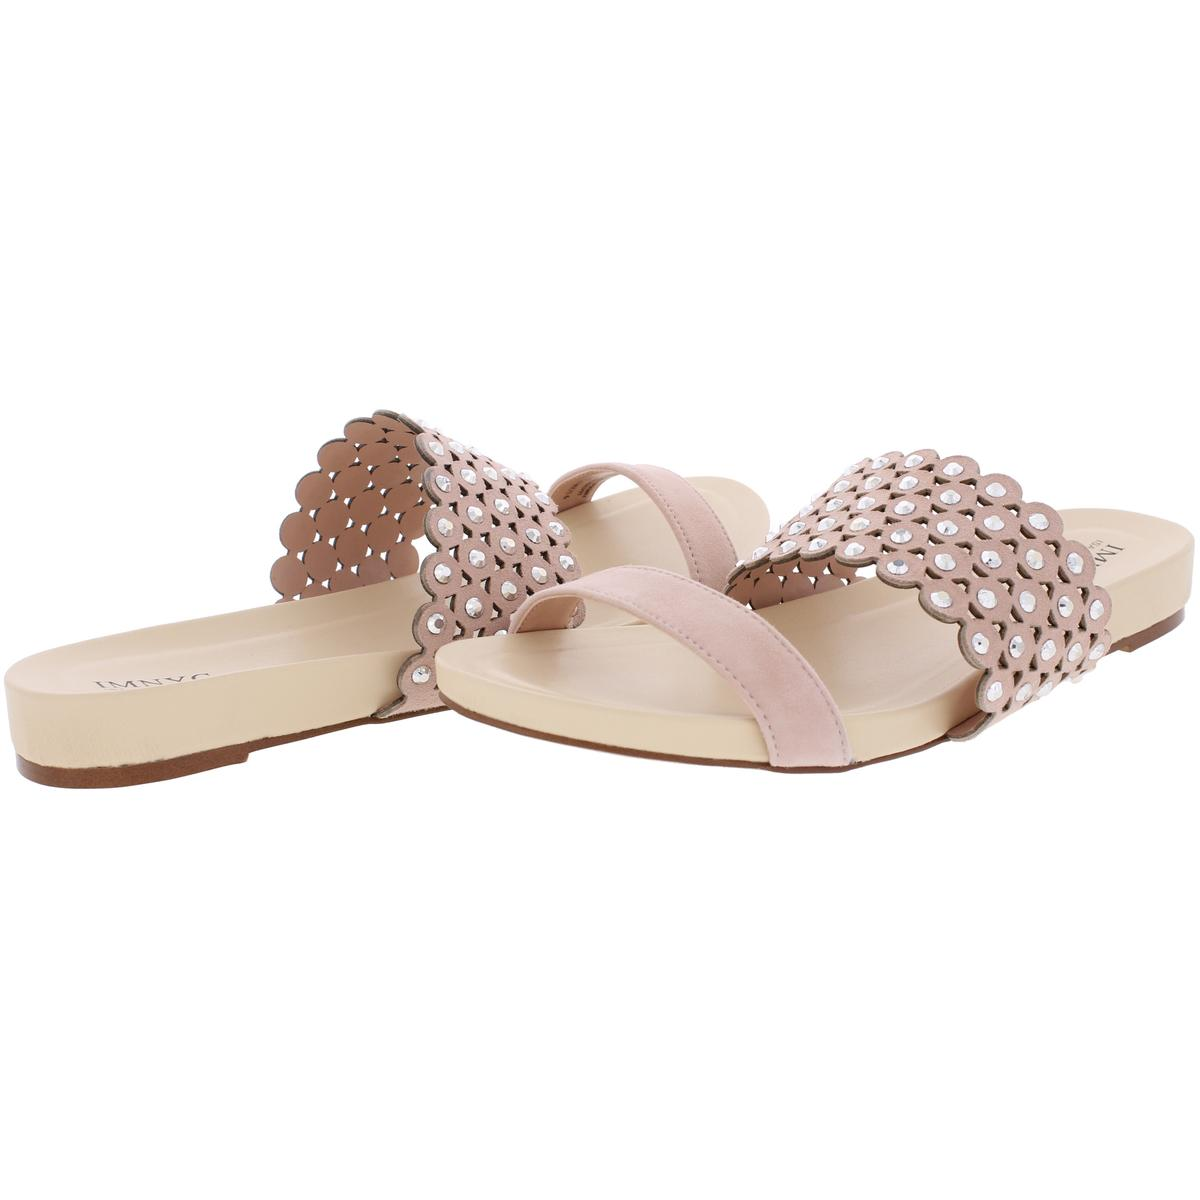 IMNYC-Isaac-Mizrahi-Womens-Suzie-Open-Toe-Studded-Slide-Sandals-Shoes-BHFO-2715 thumbnail 11